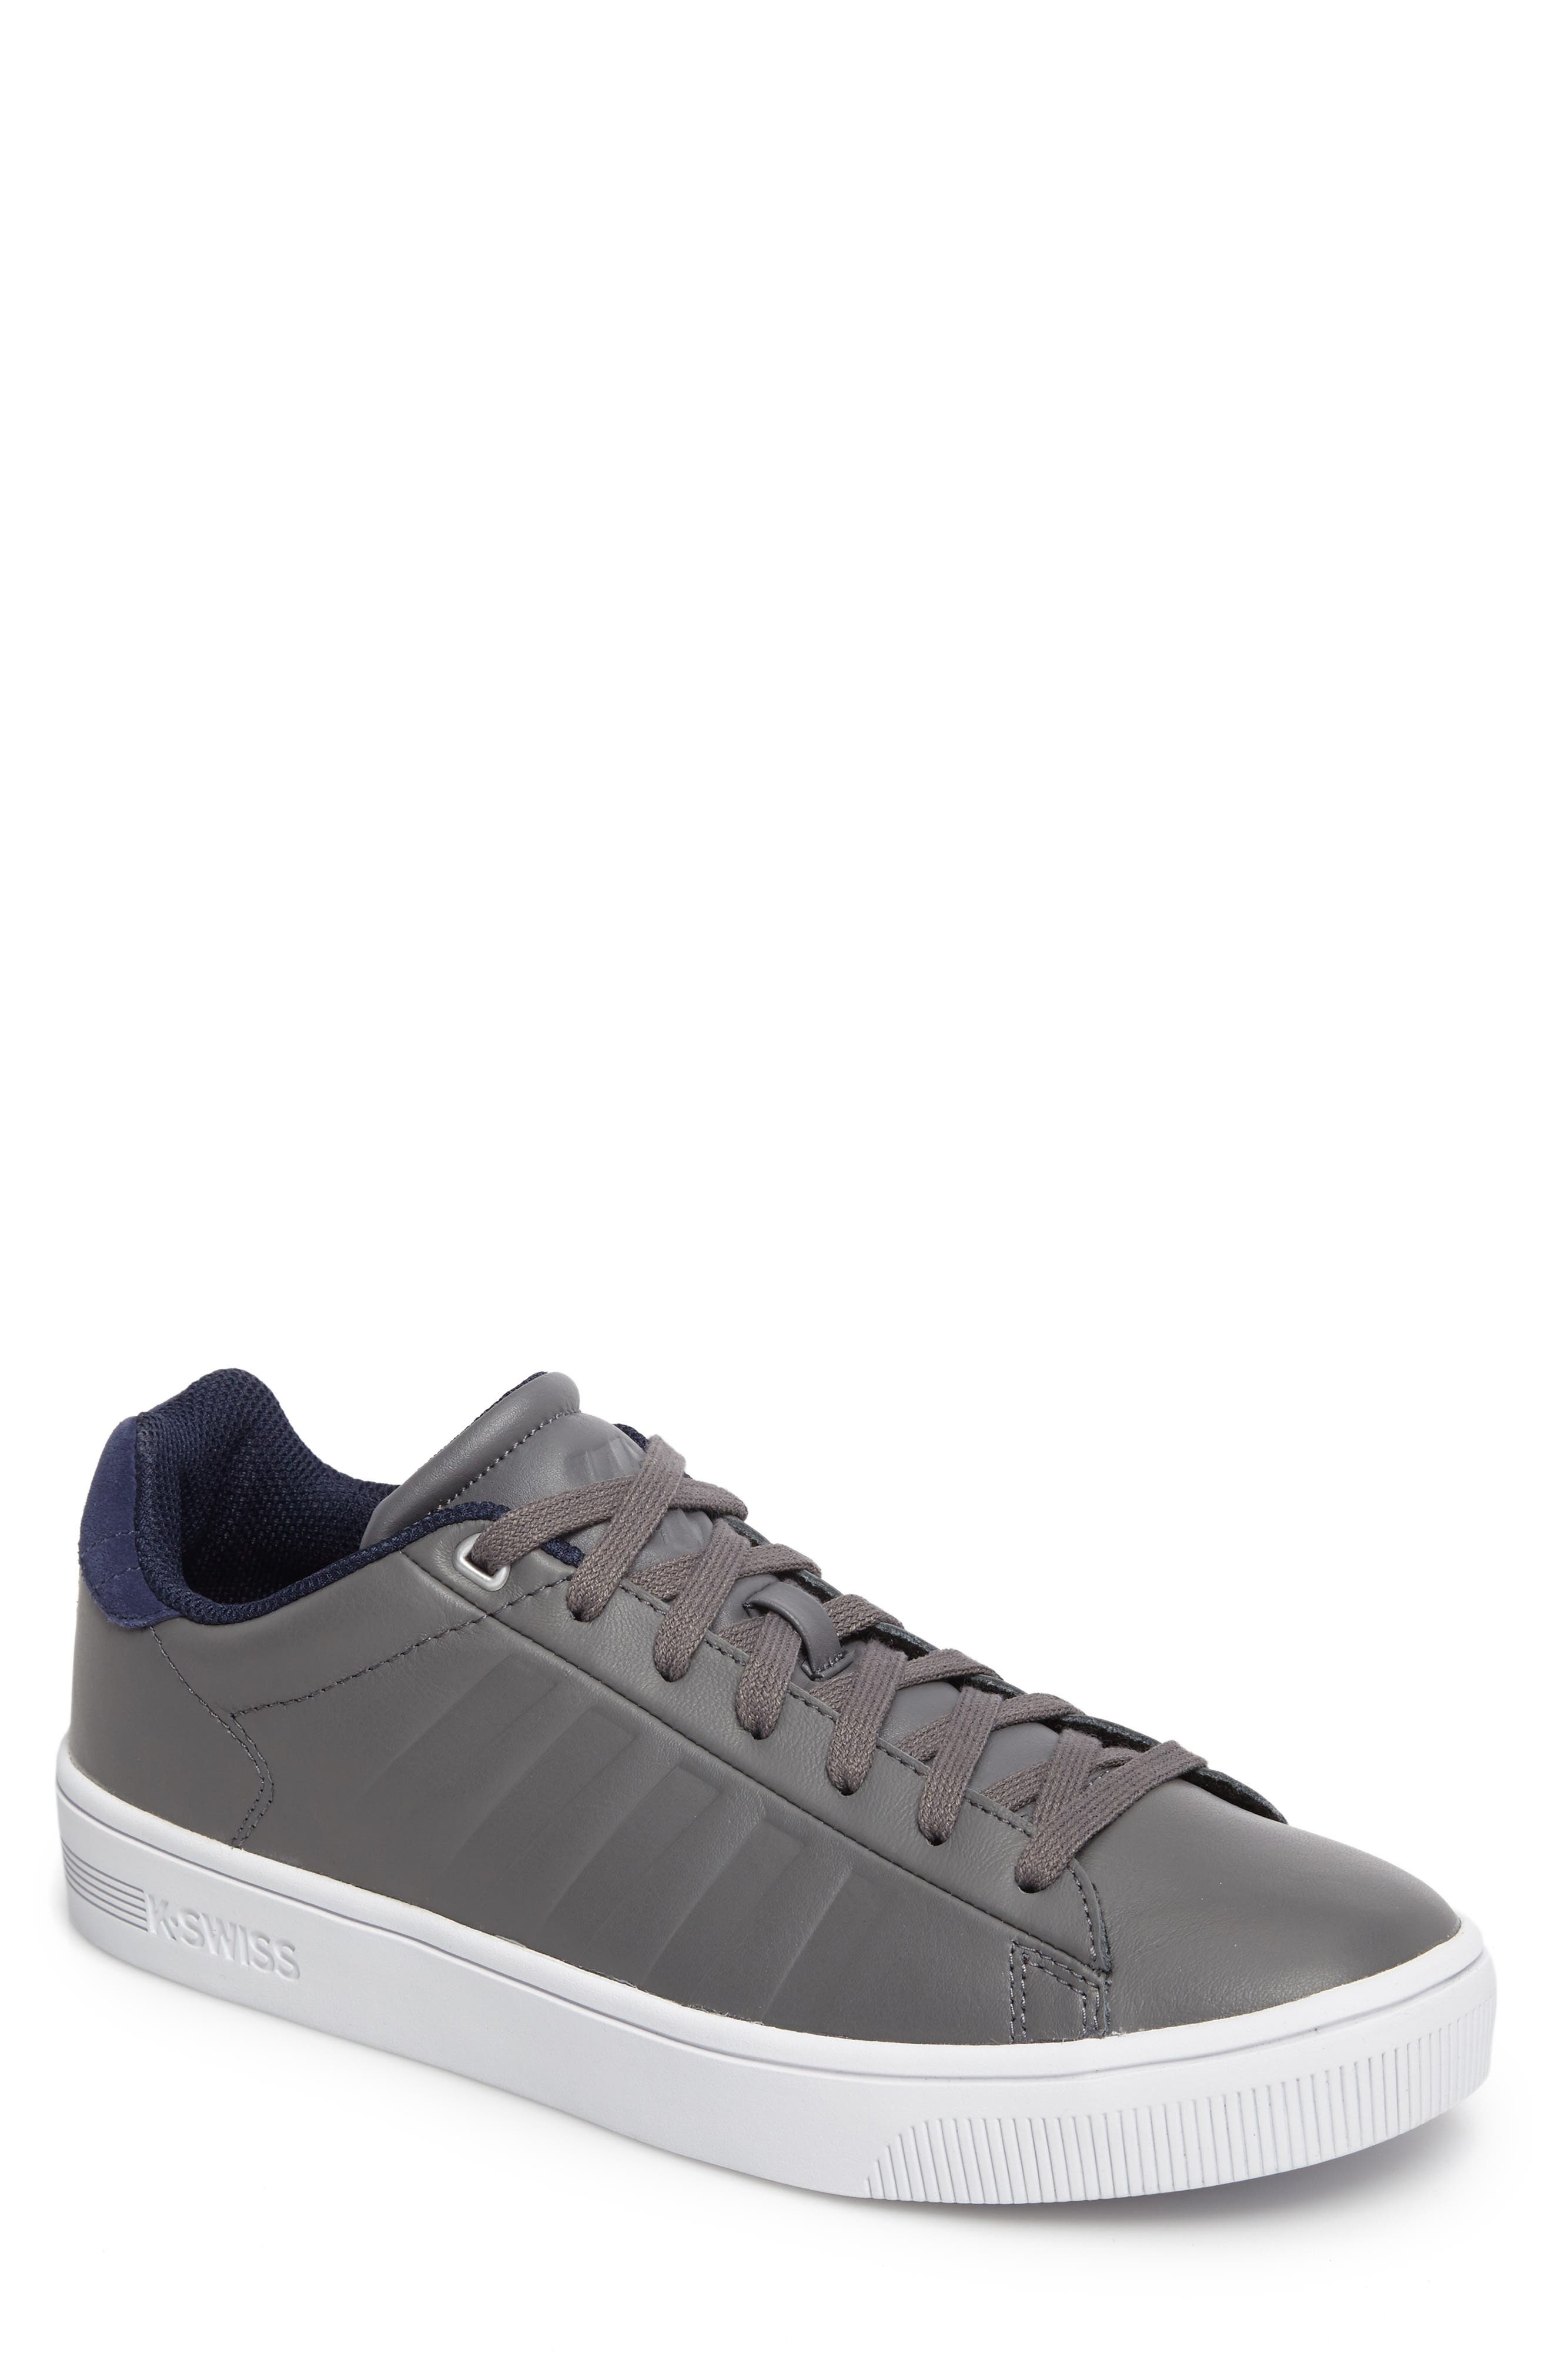 Court Frasco Sneaker,                             Main thumbnail 1, color,                             Pewter/ Patriot Blue